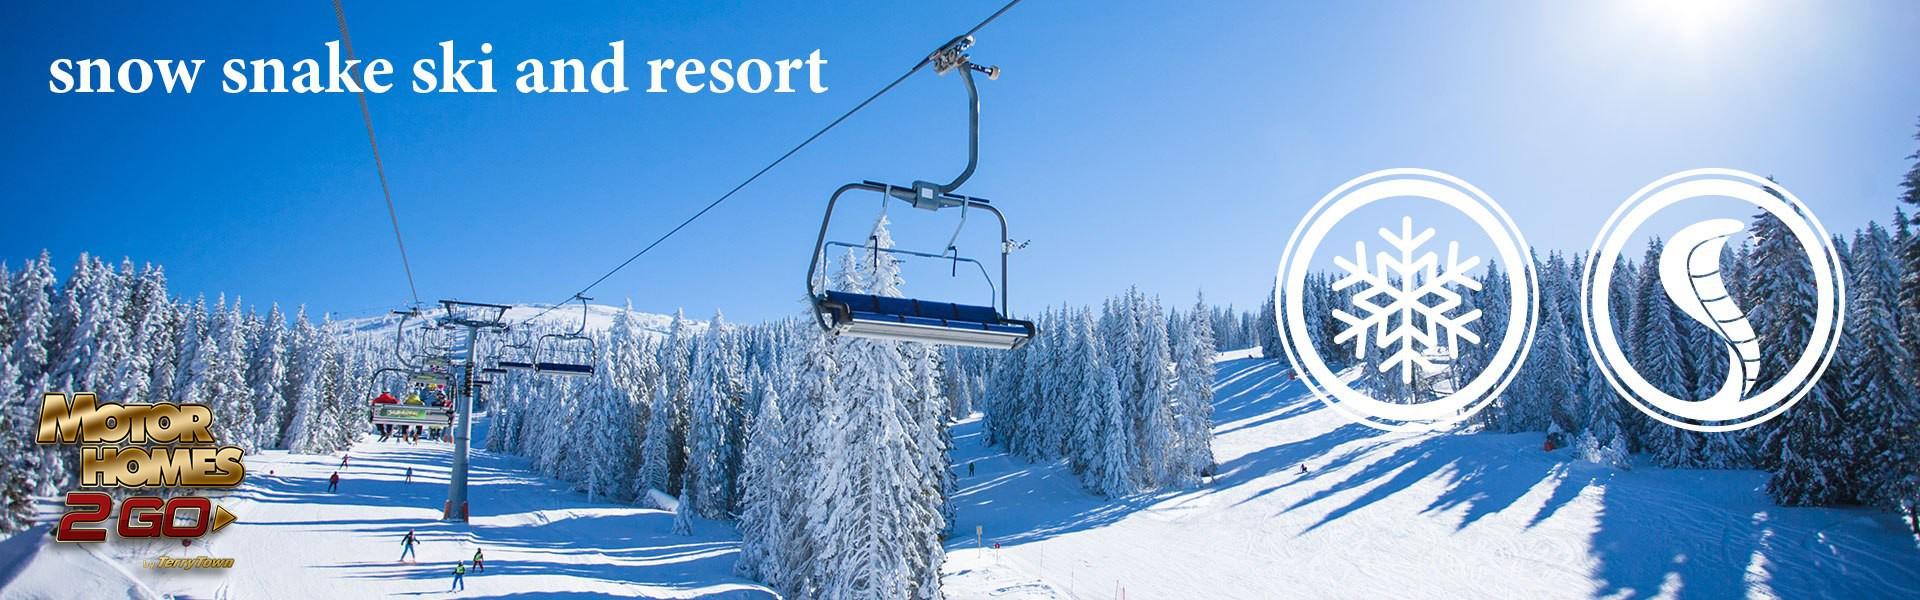 Michigan Snow Snake Ski and Resort Banner